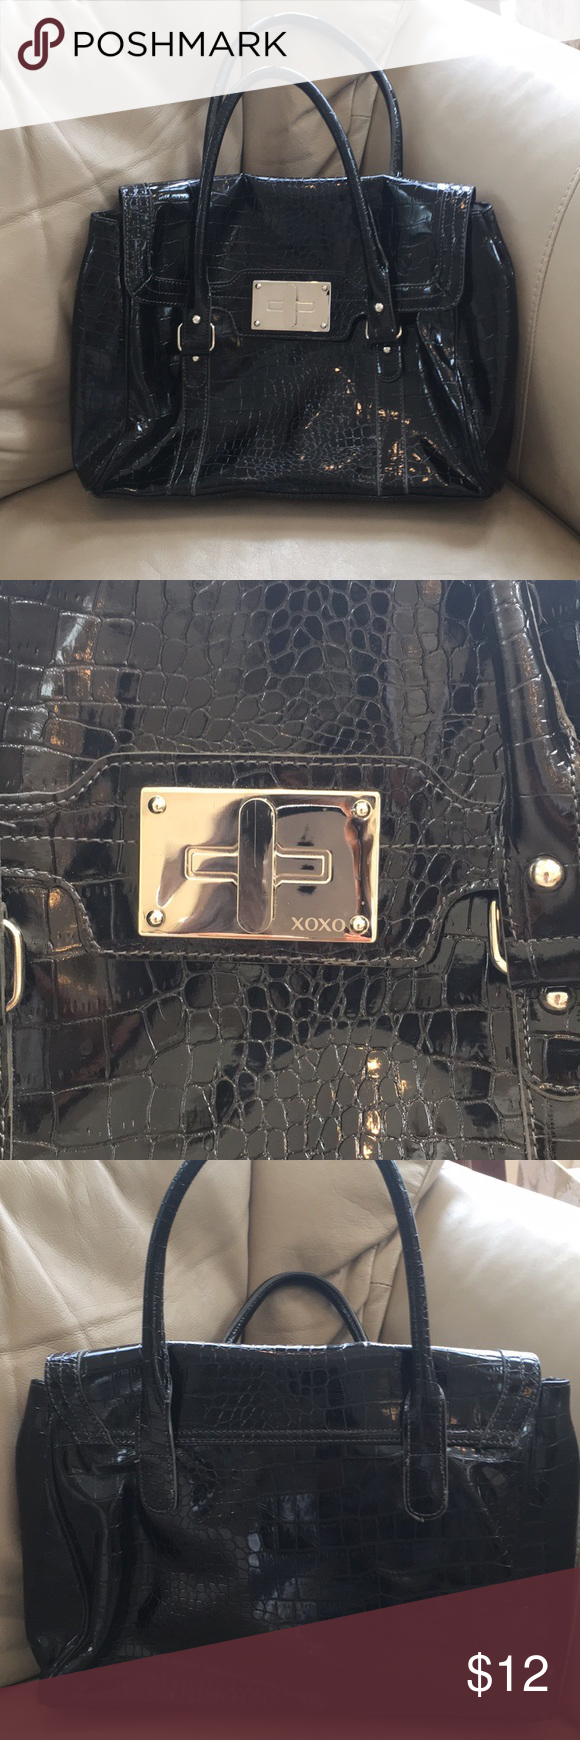 XOXO Black Handbag Black XOXO handball with magnetic front closure 14c5df0b0af98